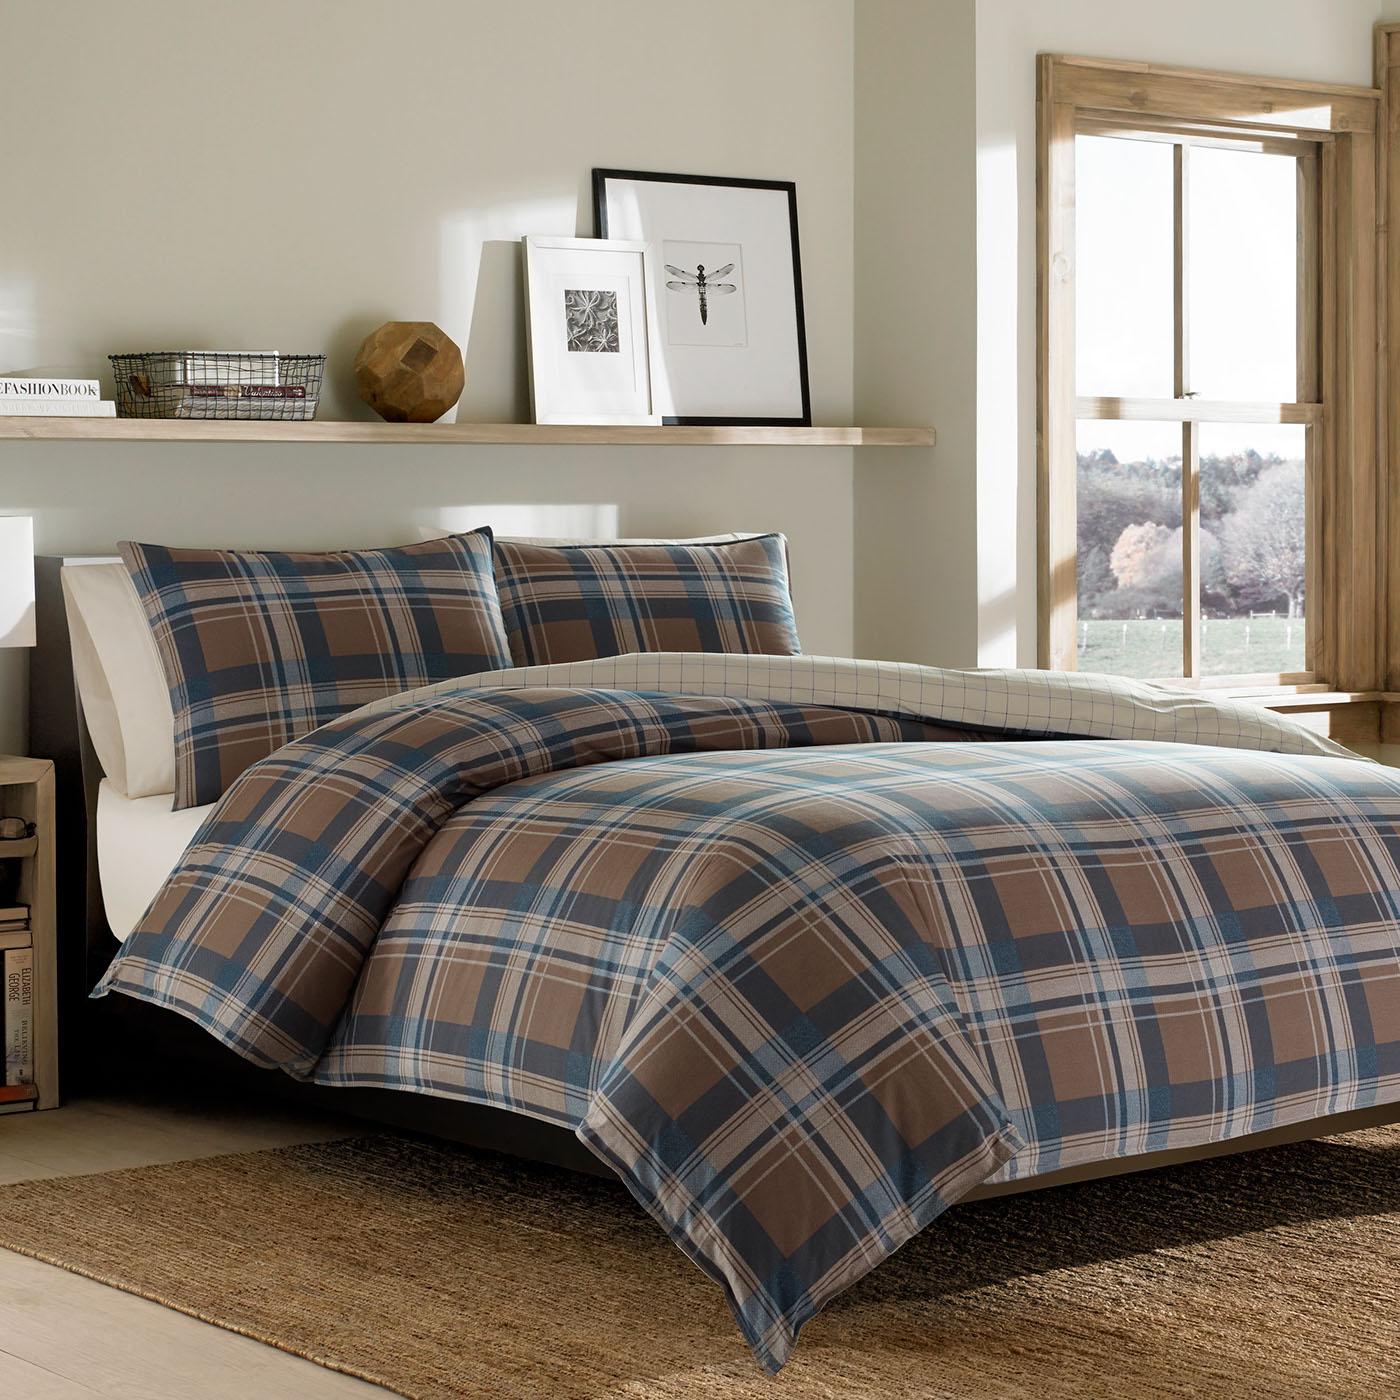 piece kids crib comforter best reviews down set toddler bauer features enchanted hollow top goose eddie bedding comforters bed